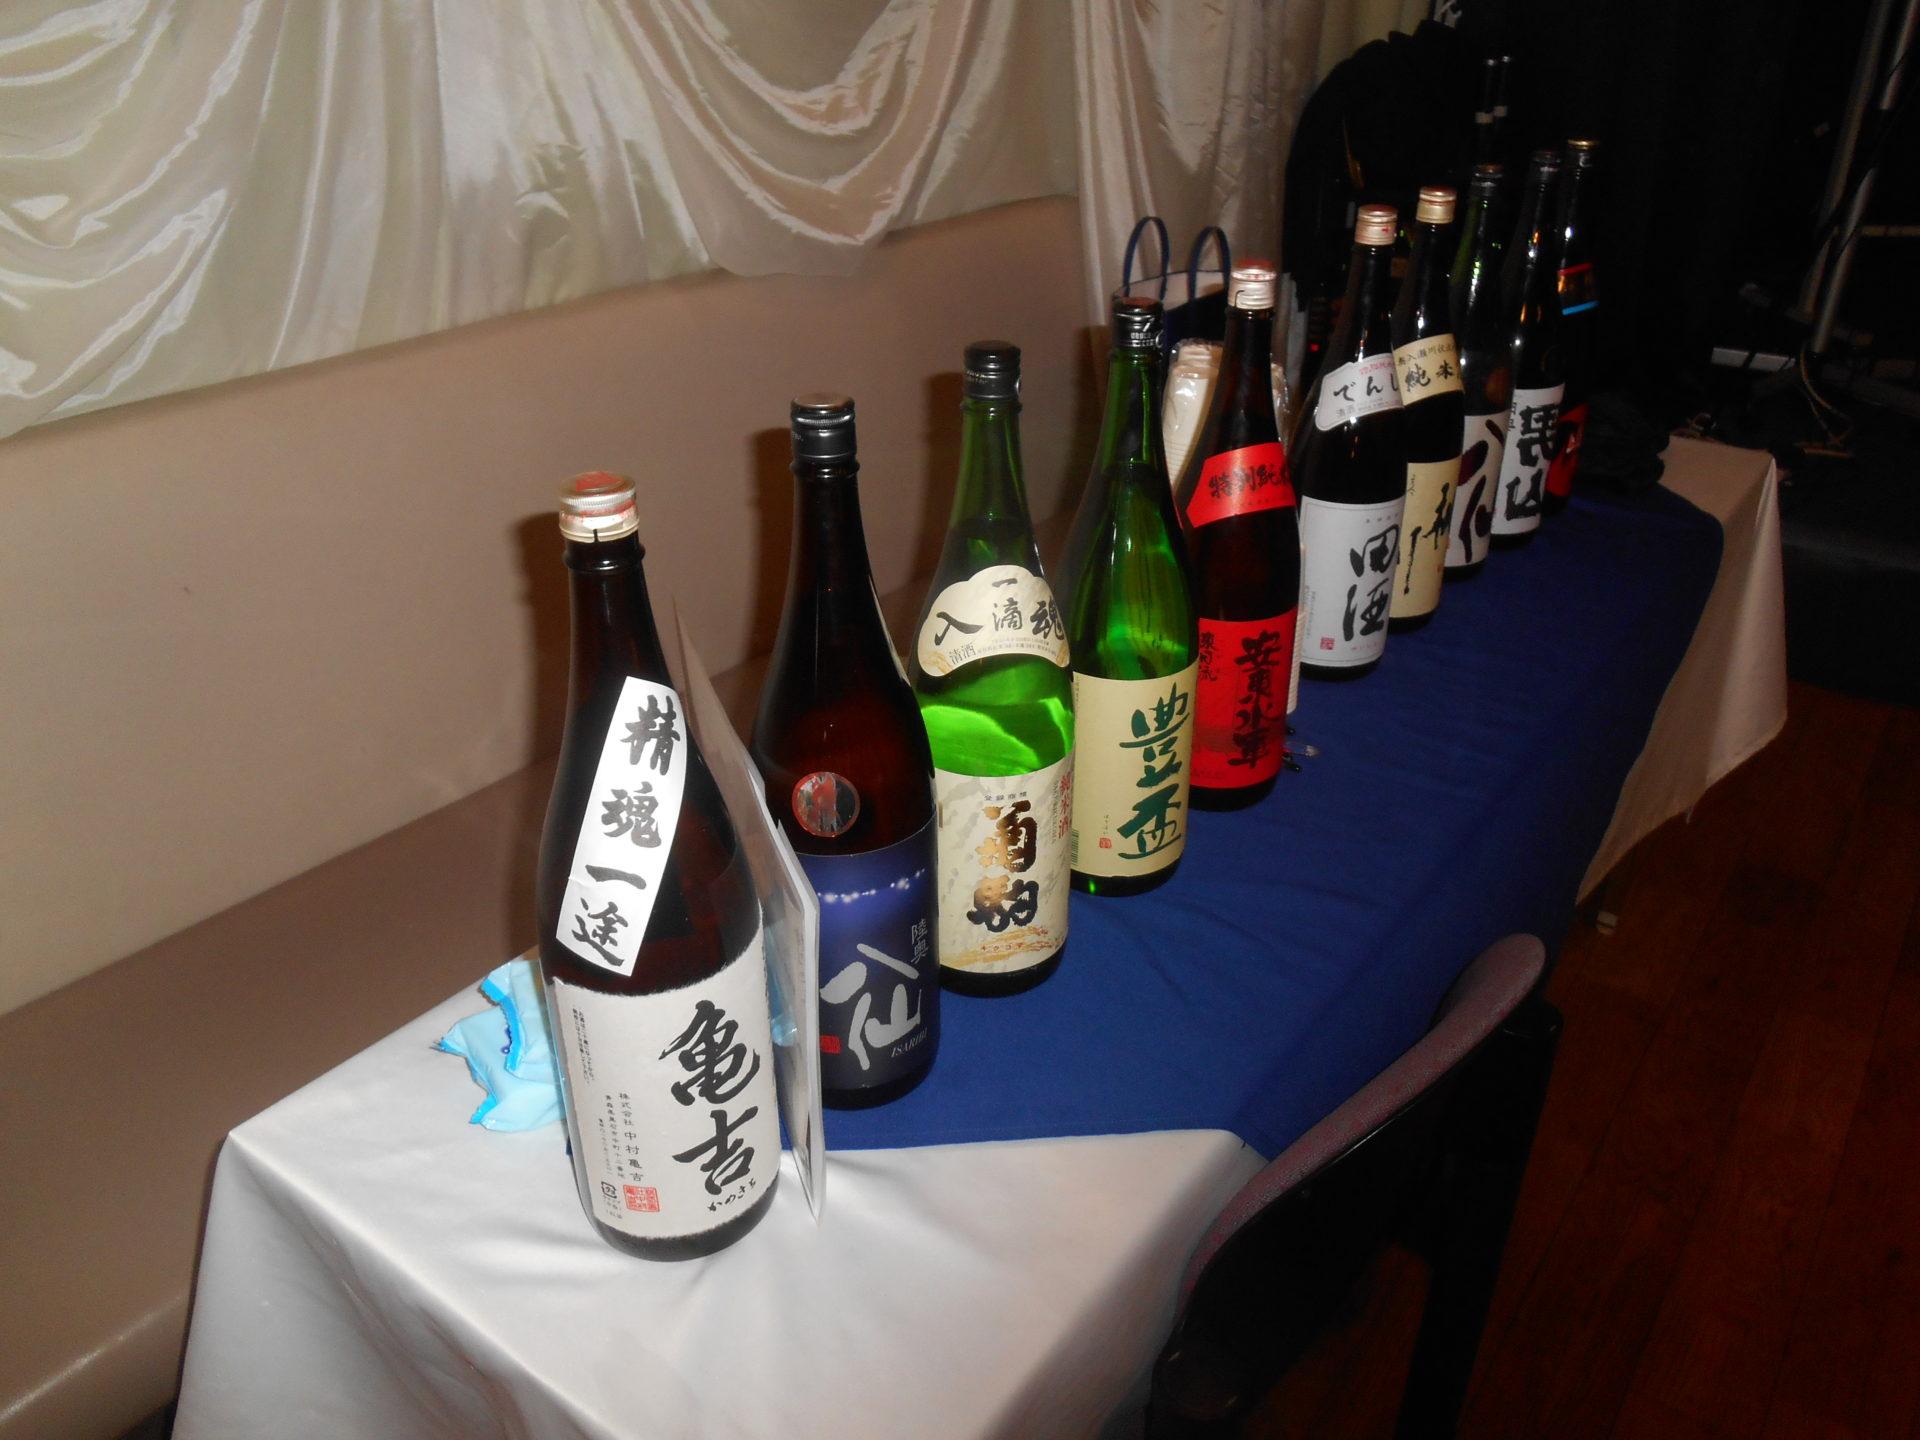 DSCN1009 1920x1440 - 2016年3月11日(金)AOsuki総会&パーティー開催しました。